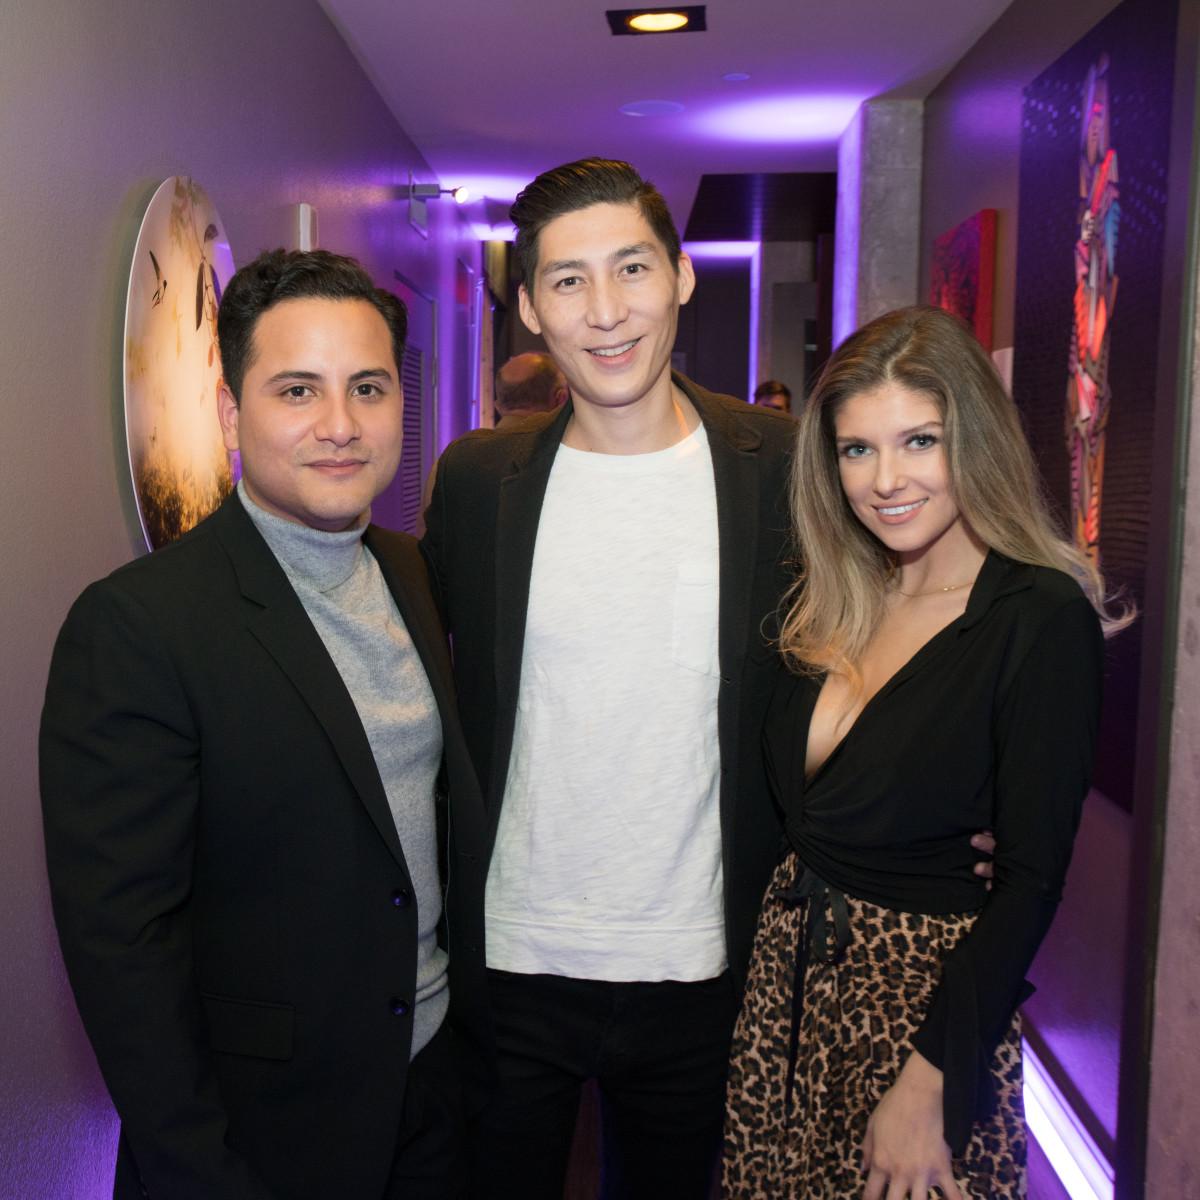 Raul Sanchez, Brandon Chin, Victoria Lynn Morin